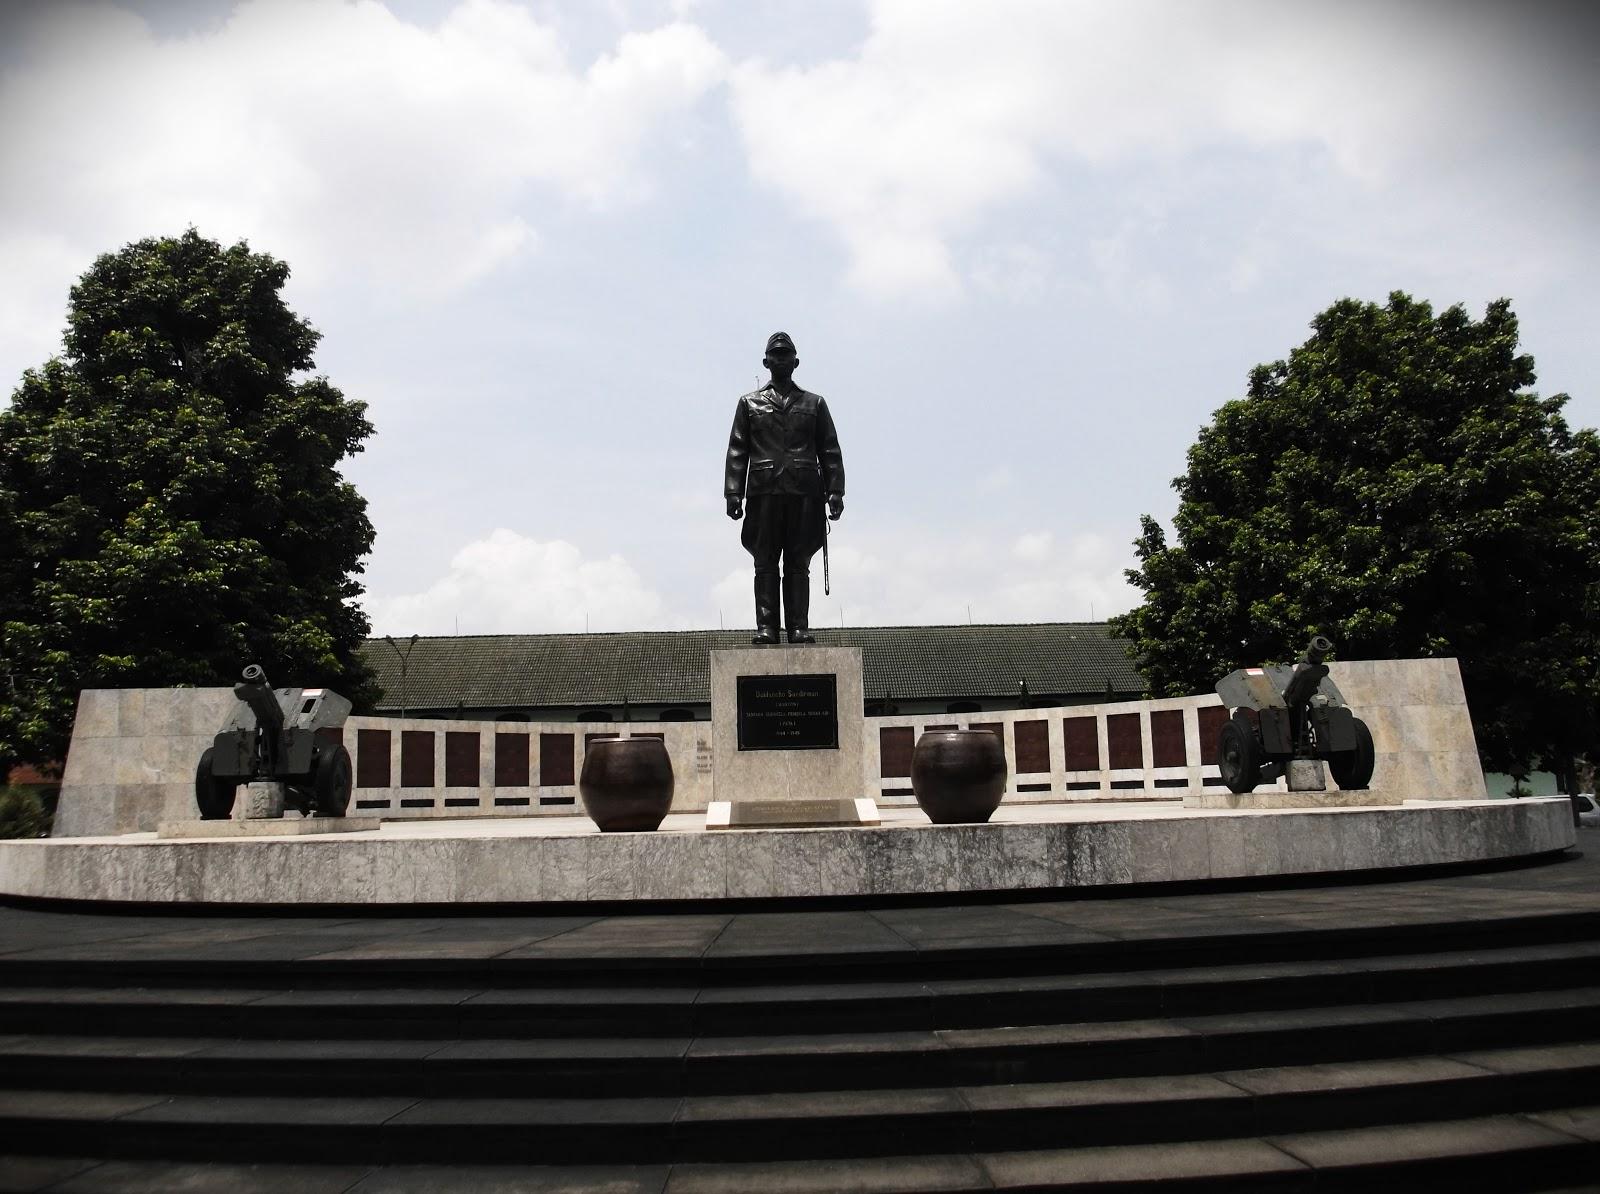 jamil s blog museum pembela tanah air peta bogor rh rifqirizky blogspot com